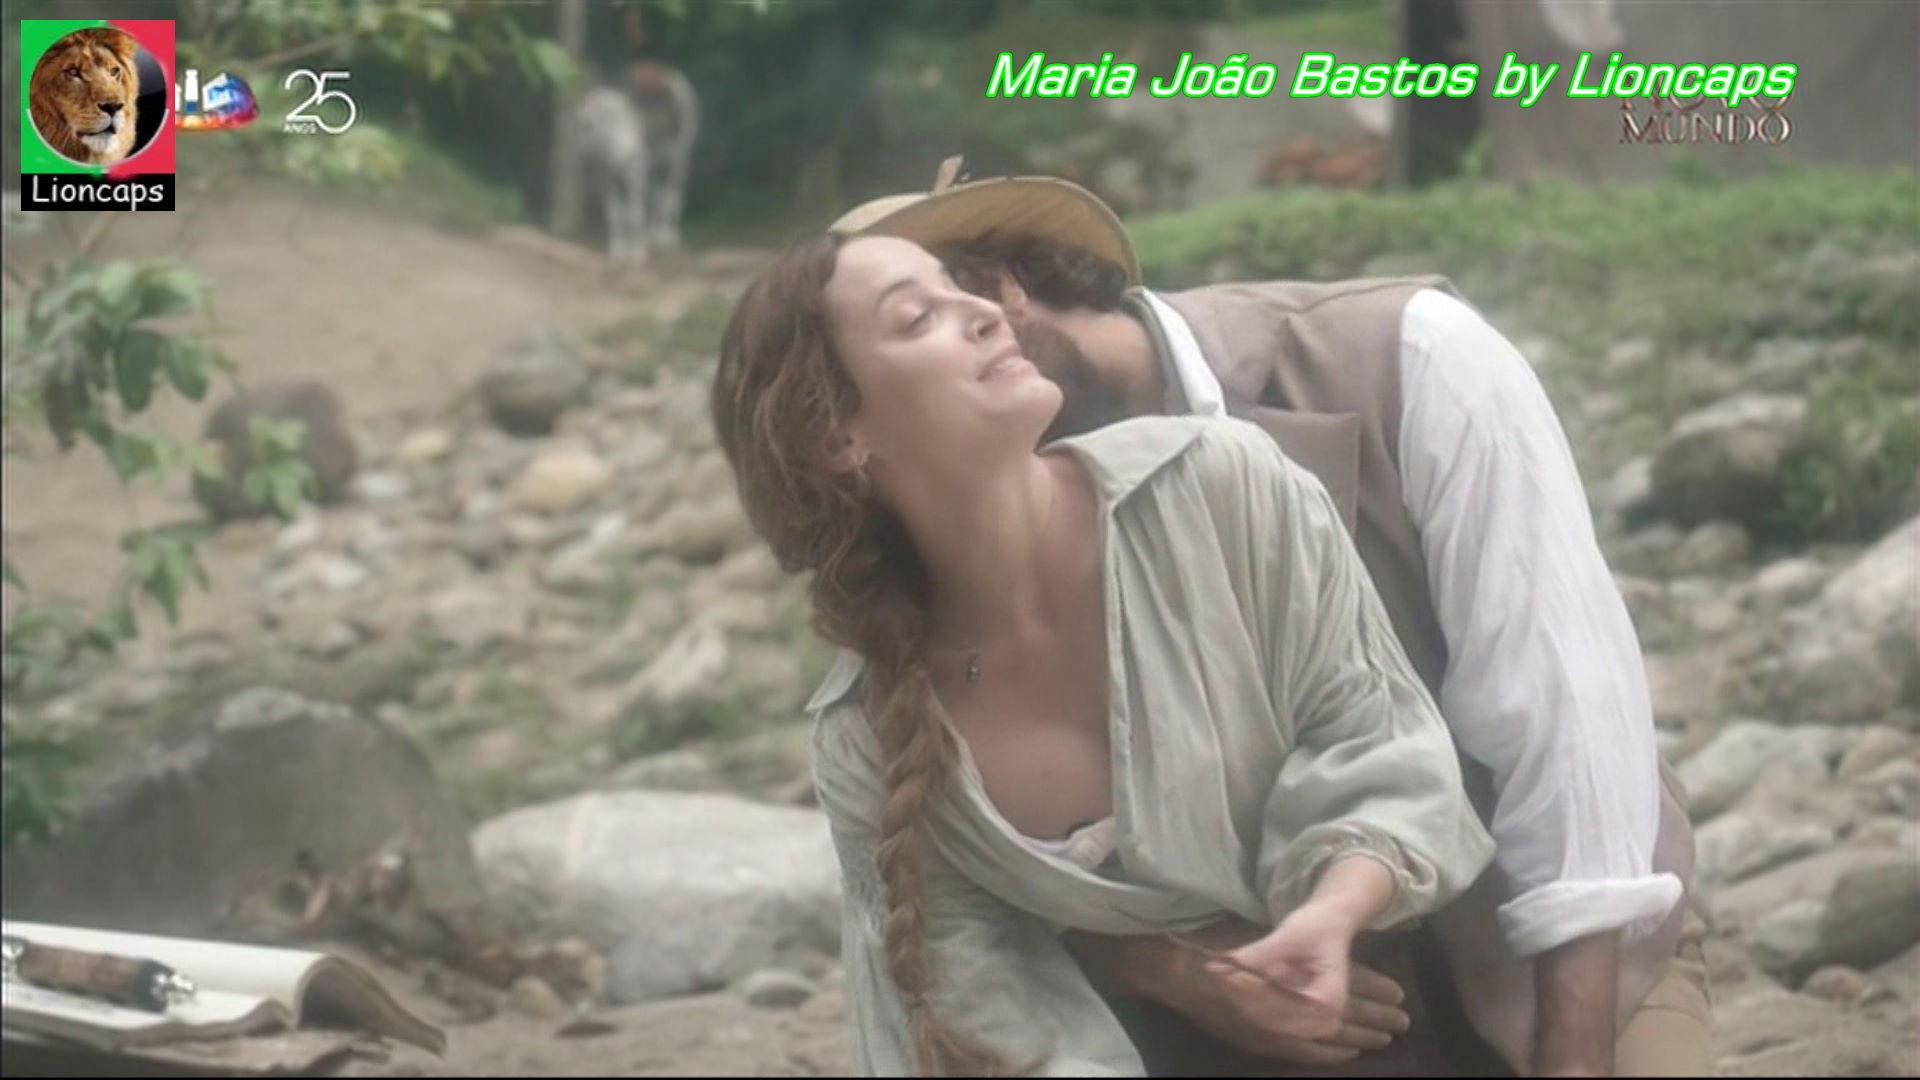 263863825_maria_joao_bastos_vs171022_1211_122_246lo.JPG